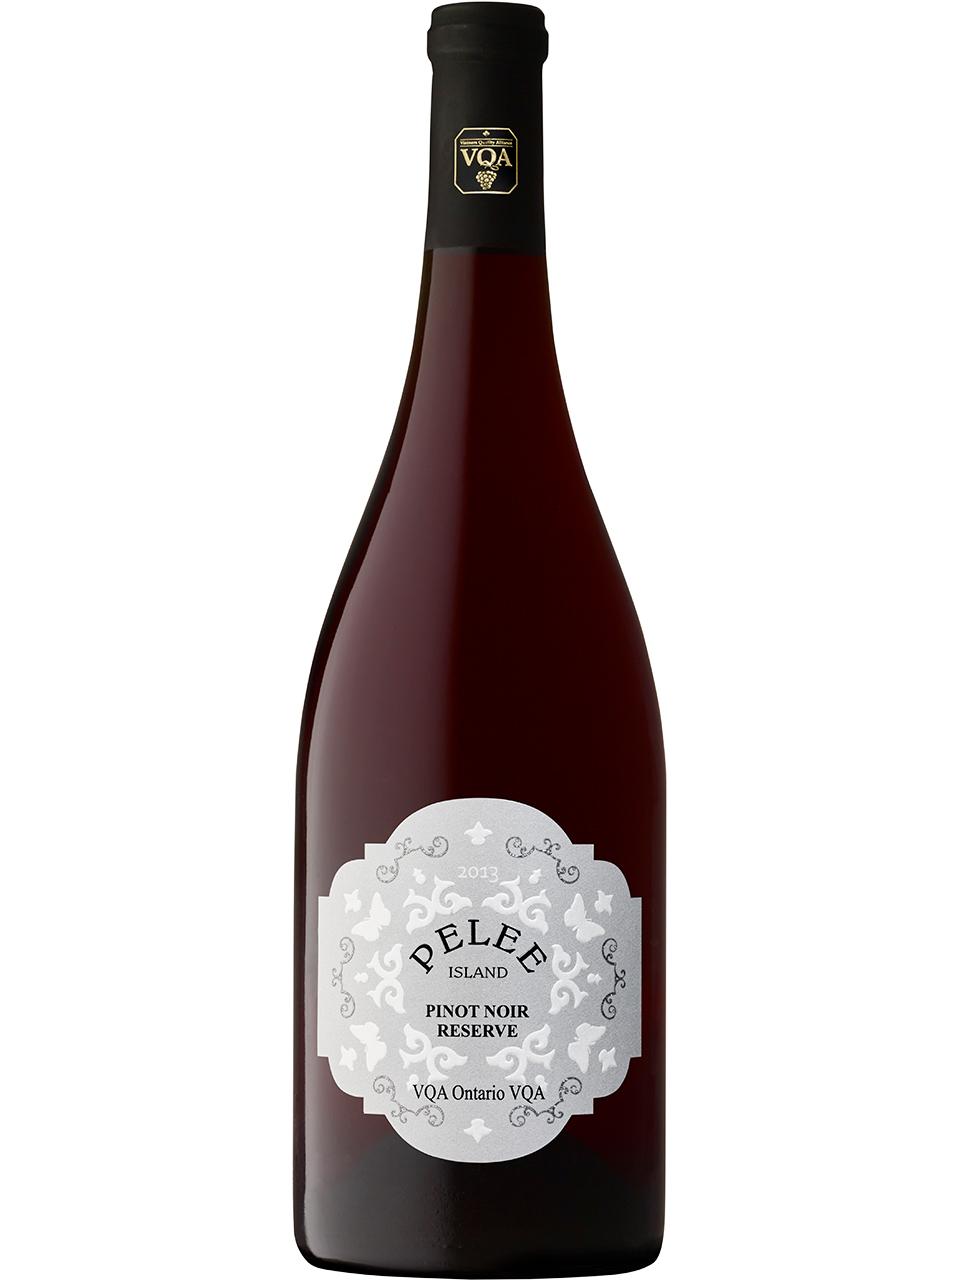 Pelee Island Pinot Noir Reserve VQA